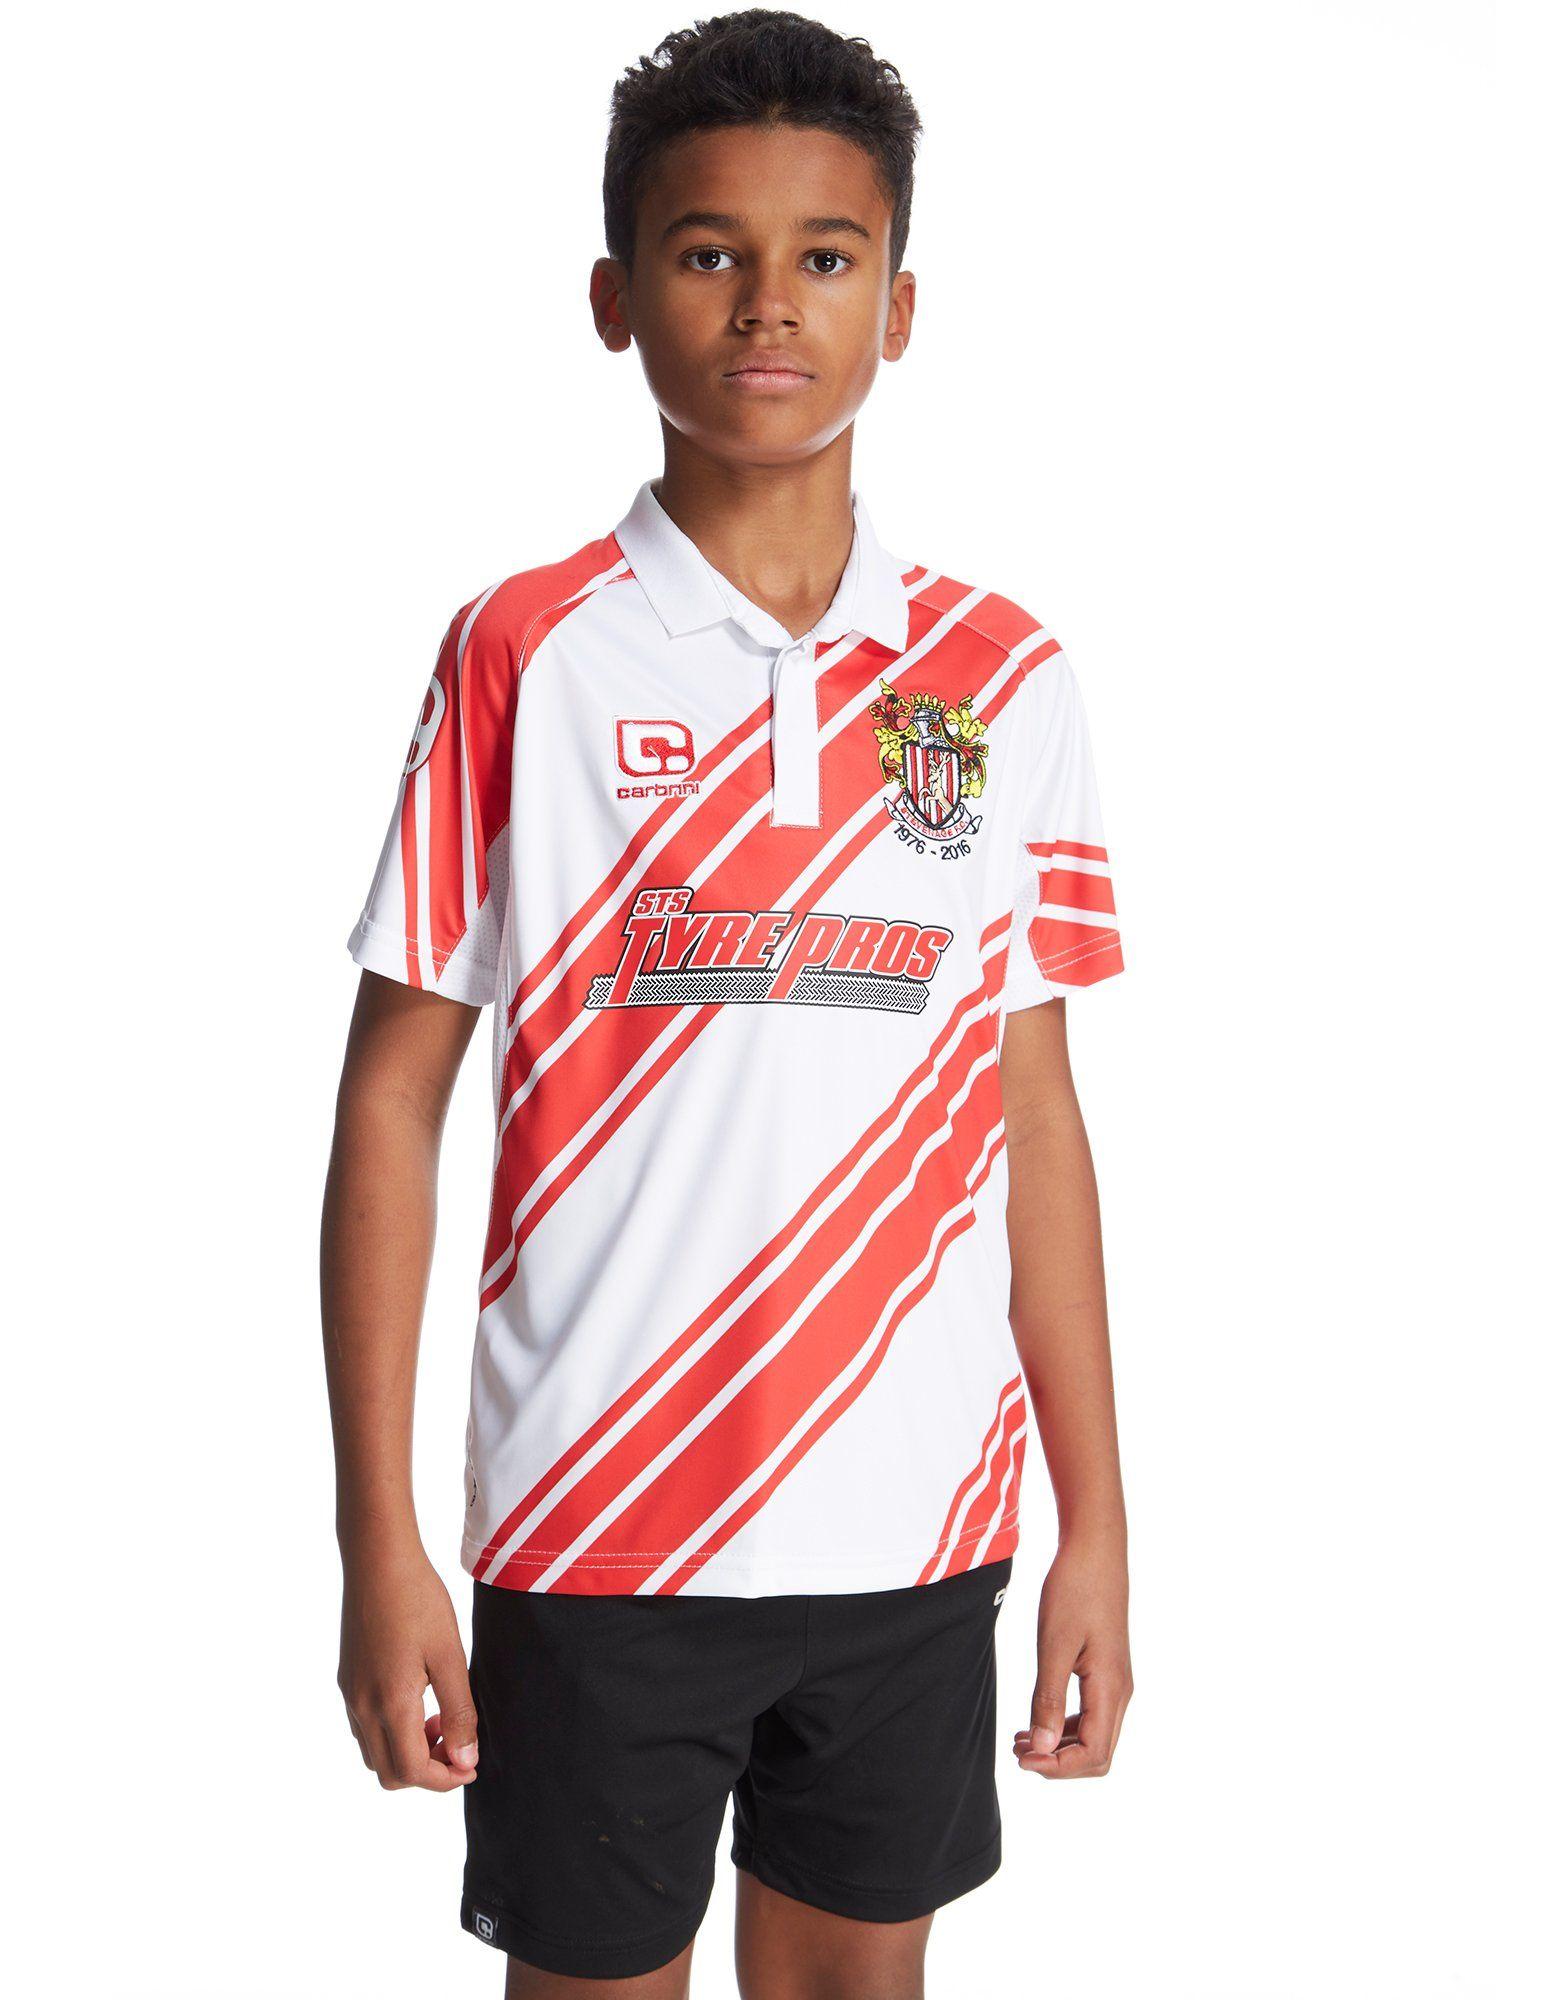 Carbrini Stevenage FC 2016/17 Home Shirt Junior